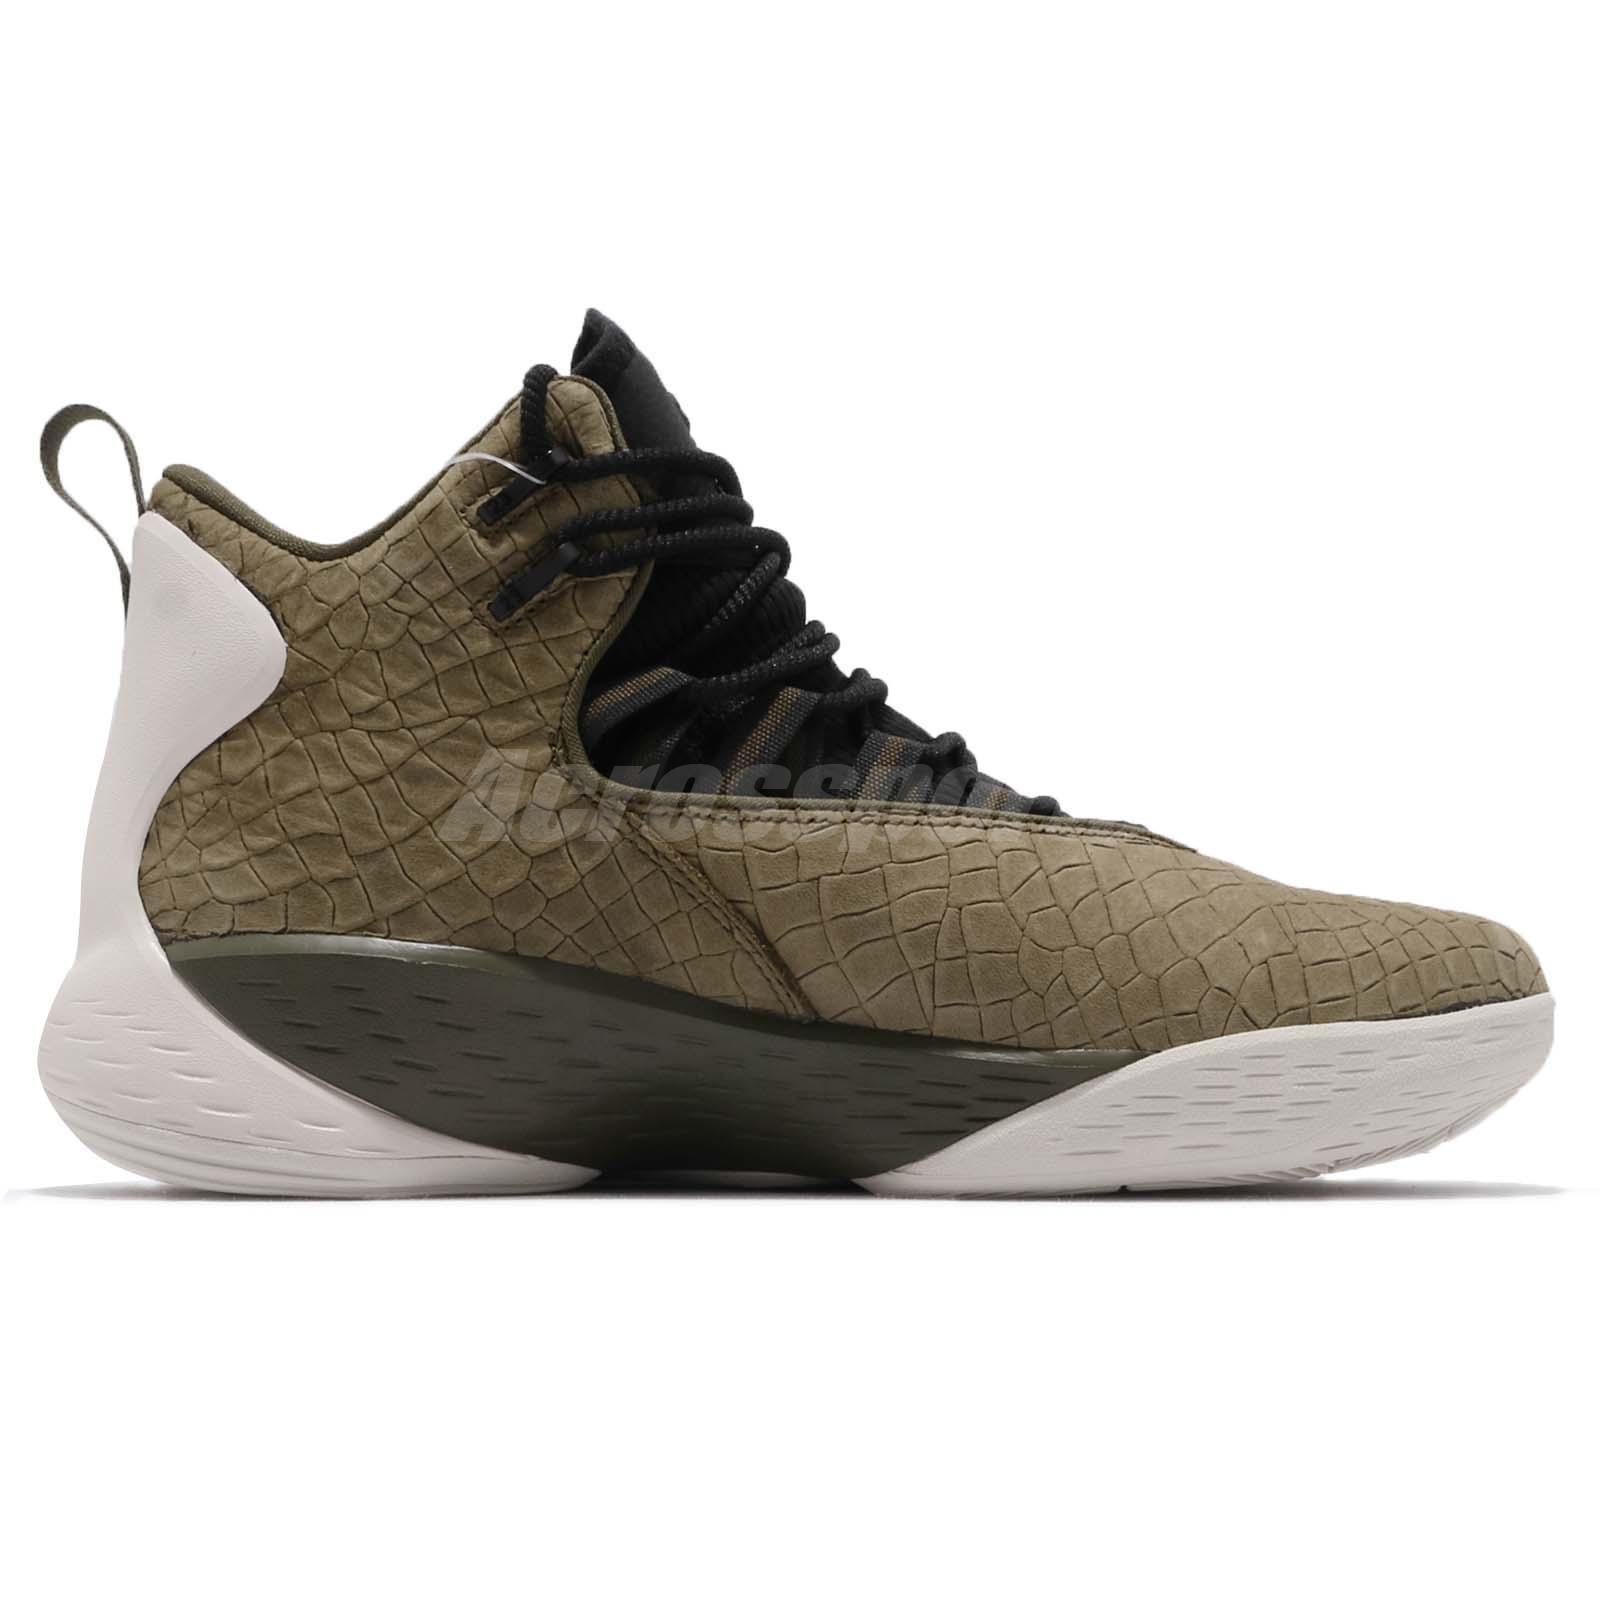 89f005820500 Nike Jordan Super.Fly MVP PF Olive Canvas Black Men Basketball Shoes ...